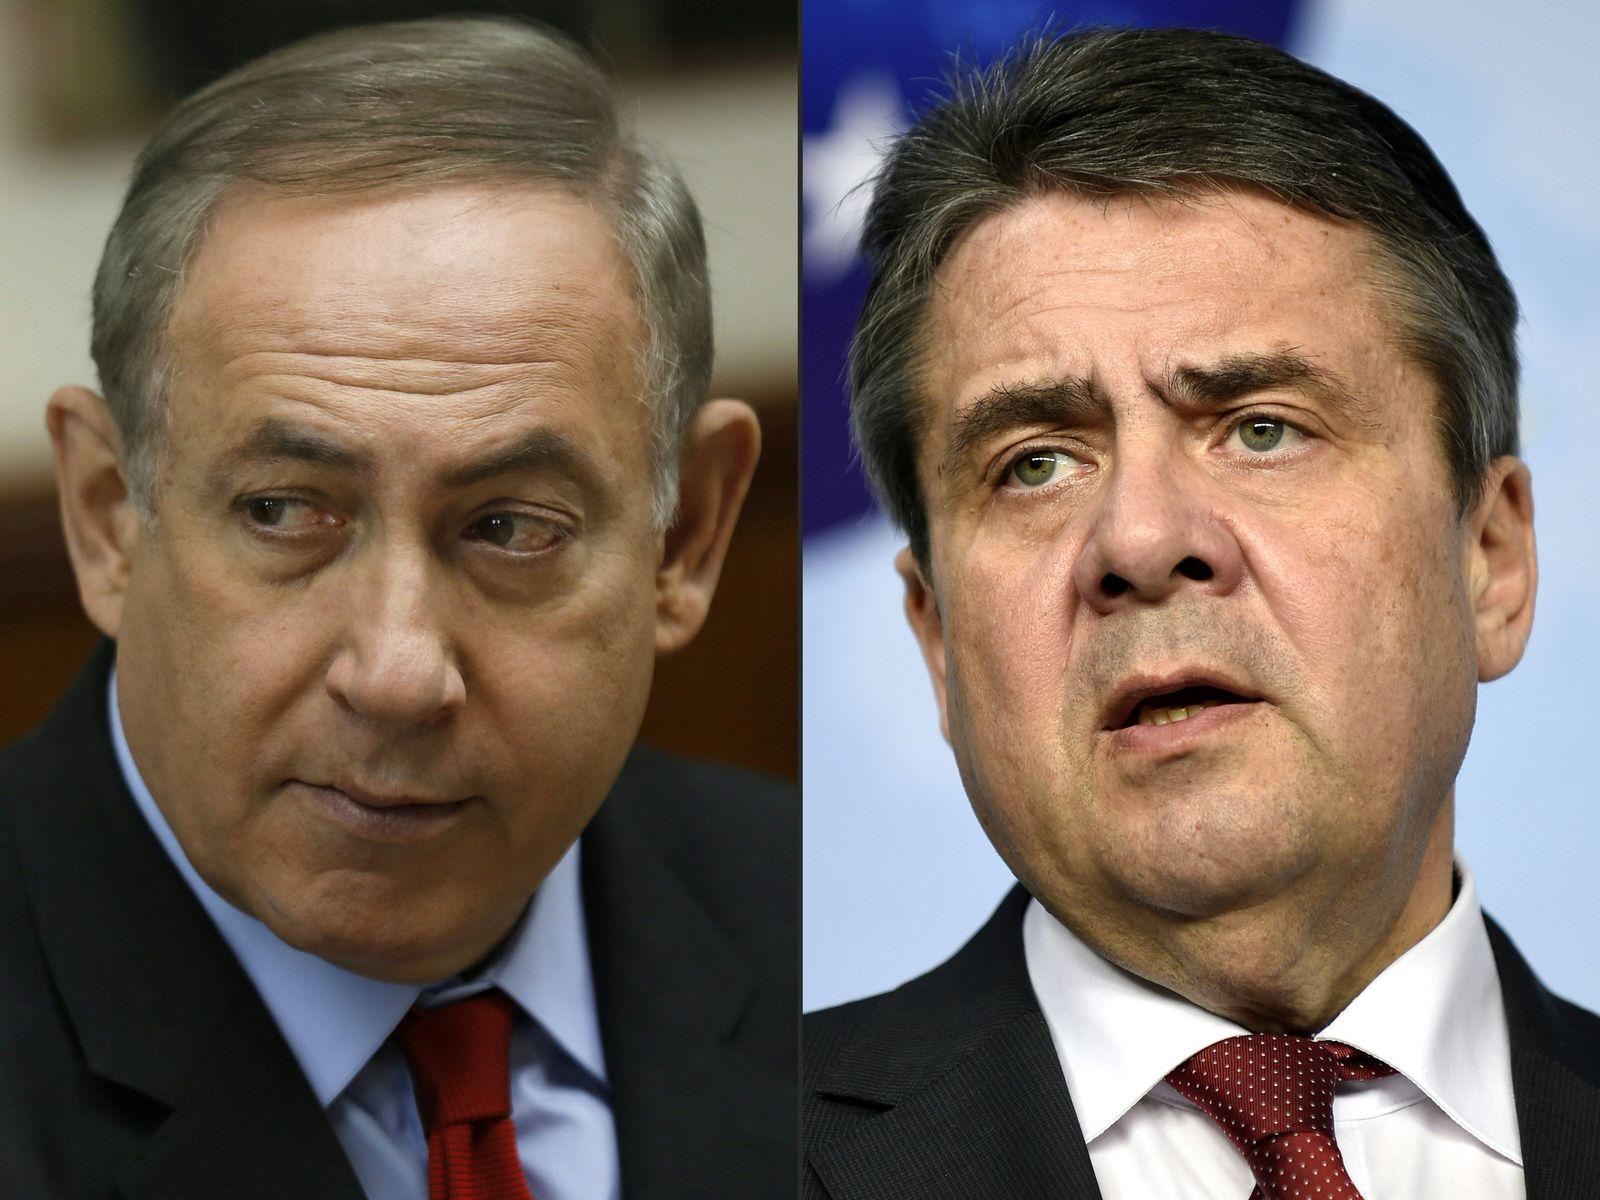 Benjamin Netanyahu / Sigmar Gabriel KOMBO